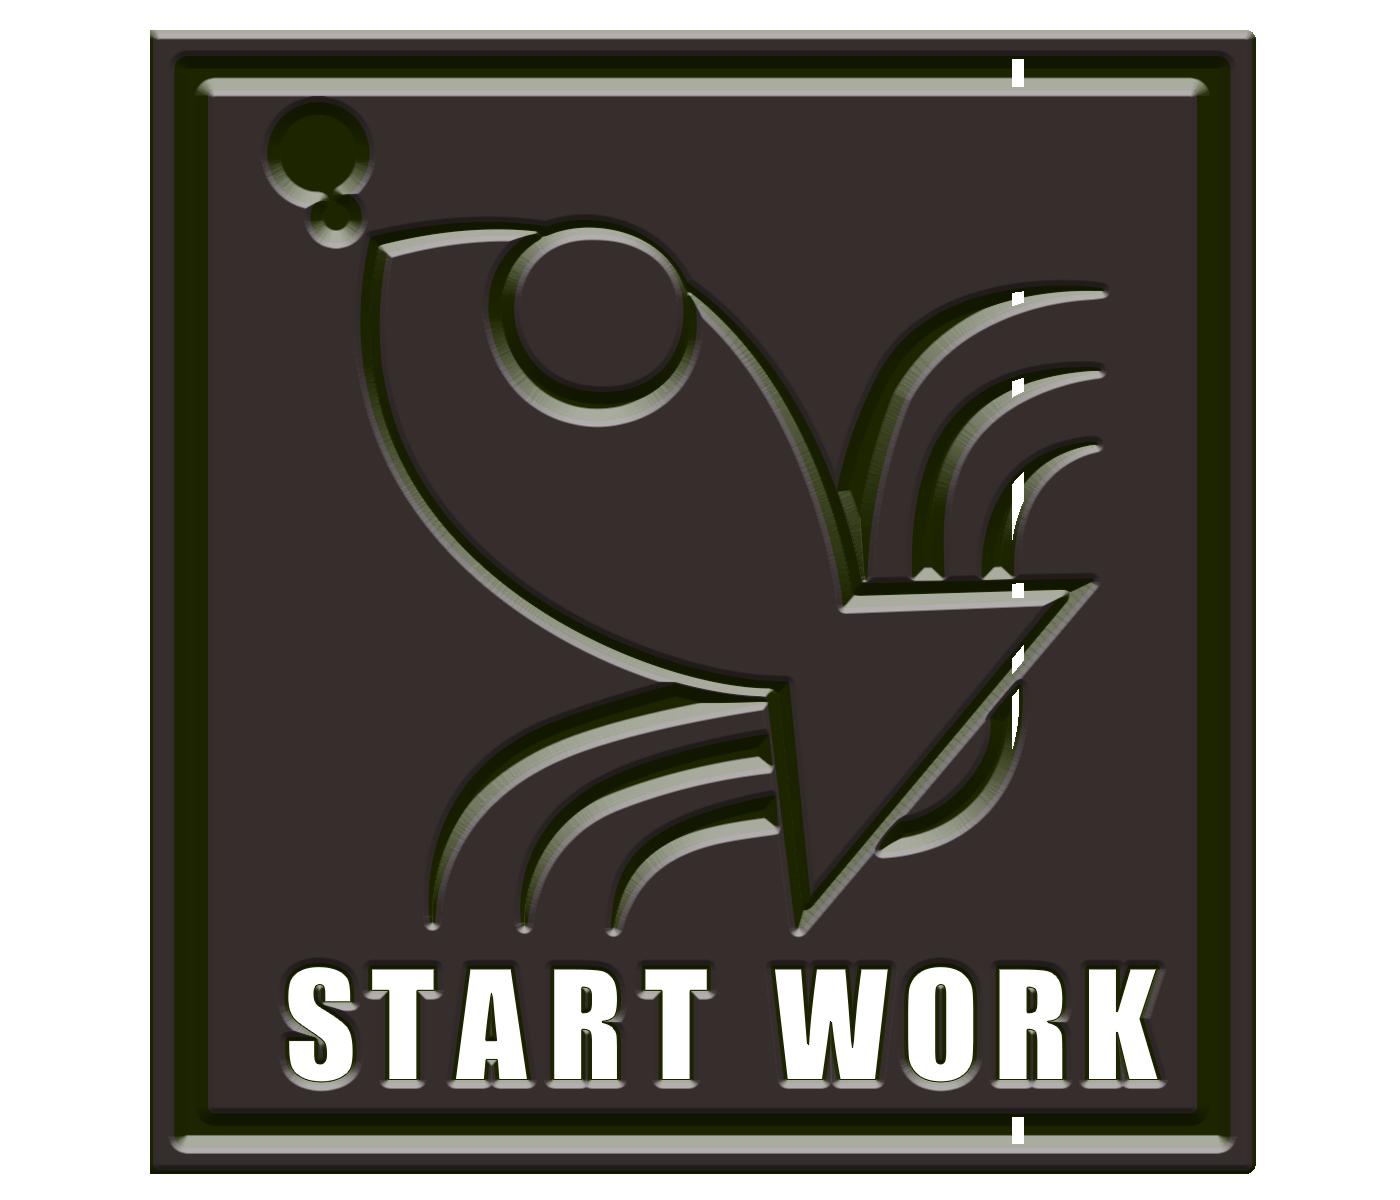 尼崎市の就労継続支援B型 START WORK